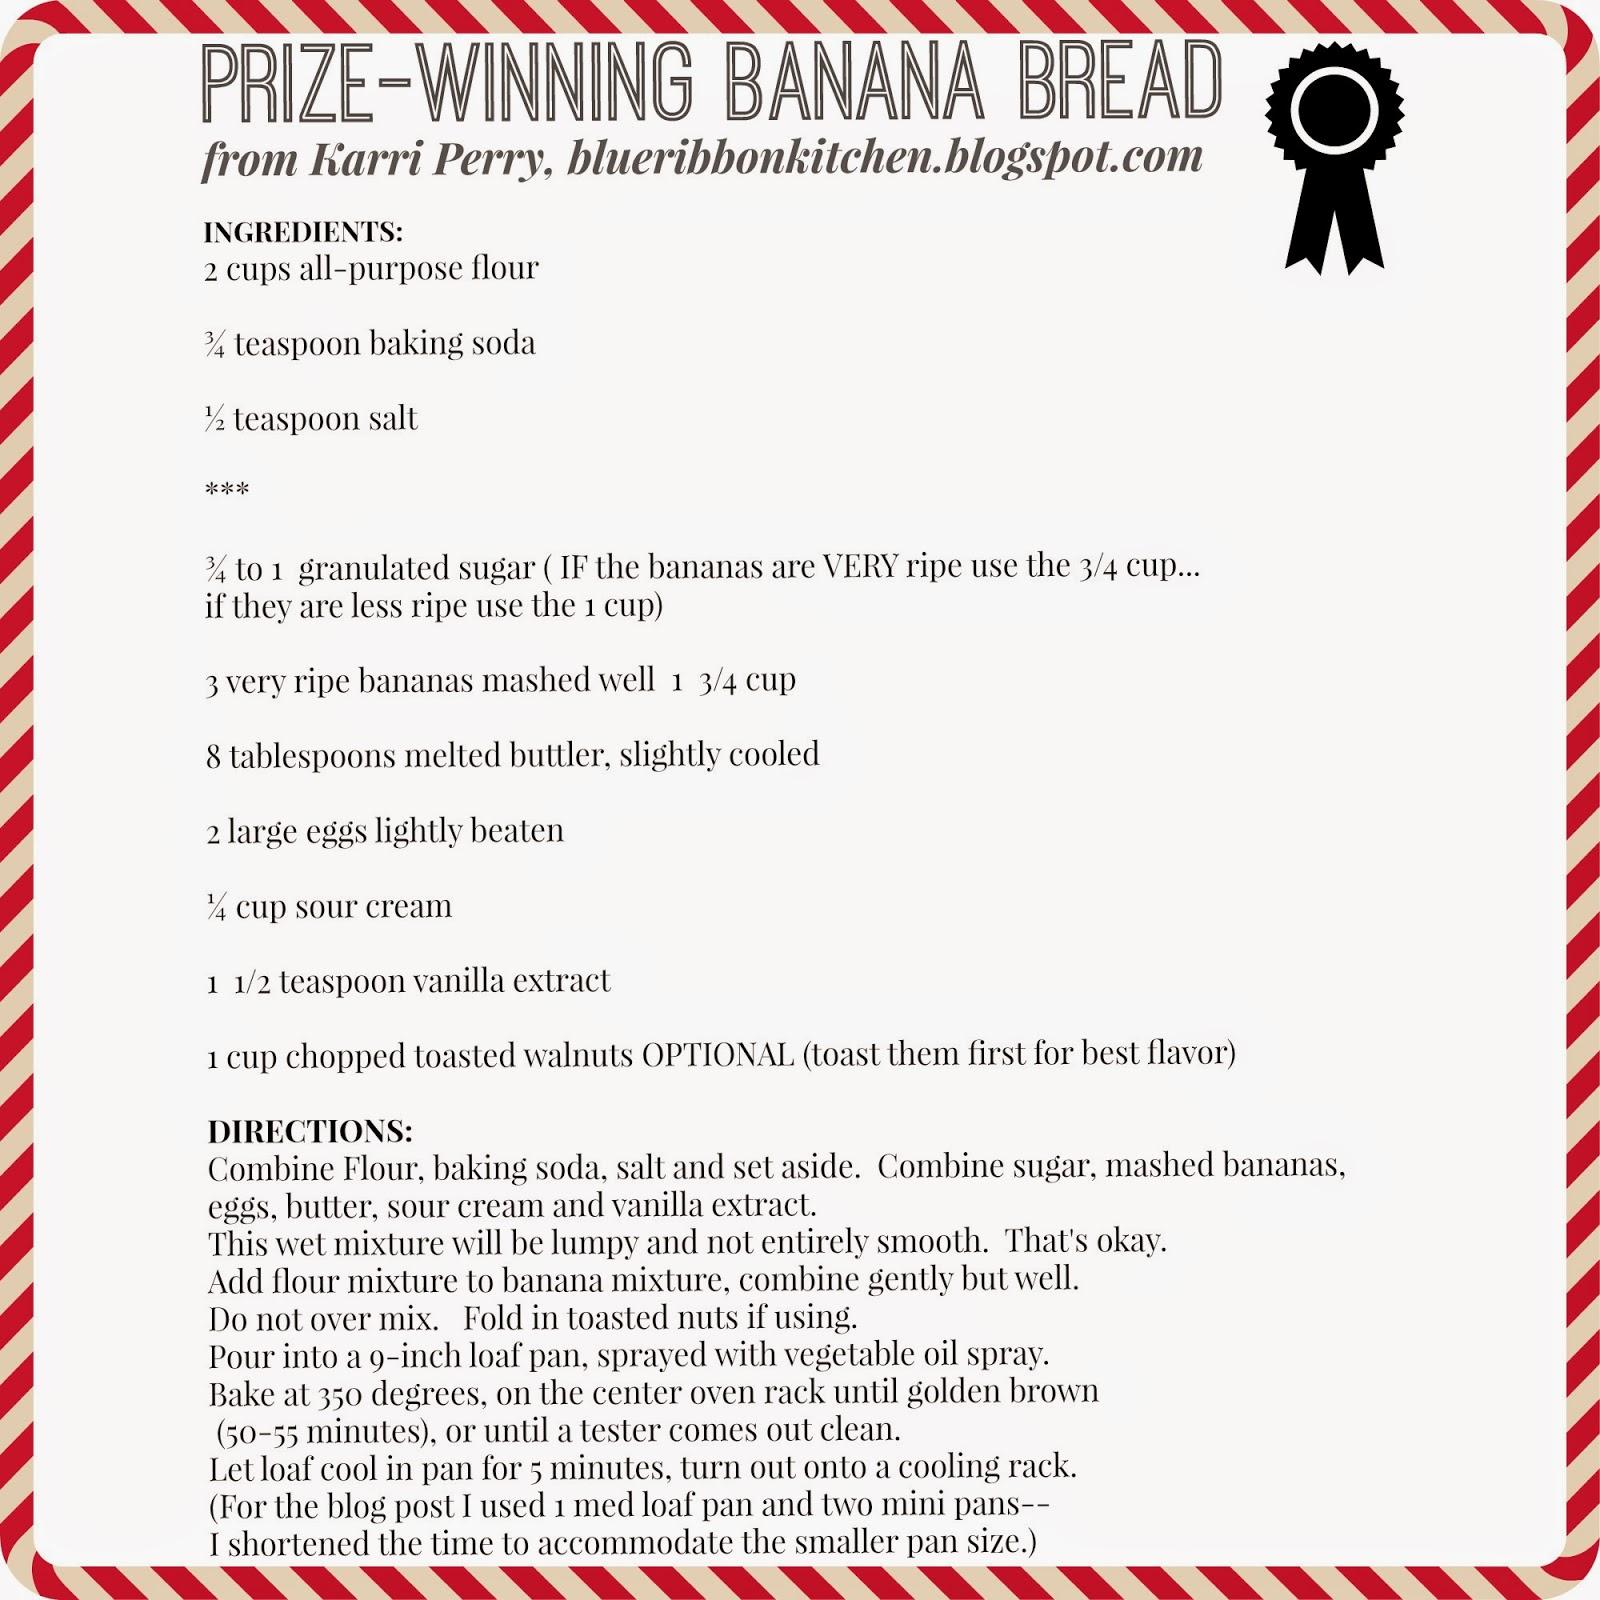 Blue Ribbon Kitchen: Prize-Winning Banana Bread